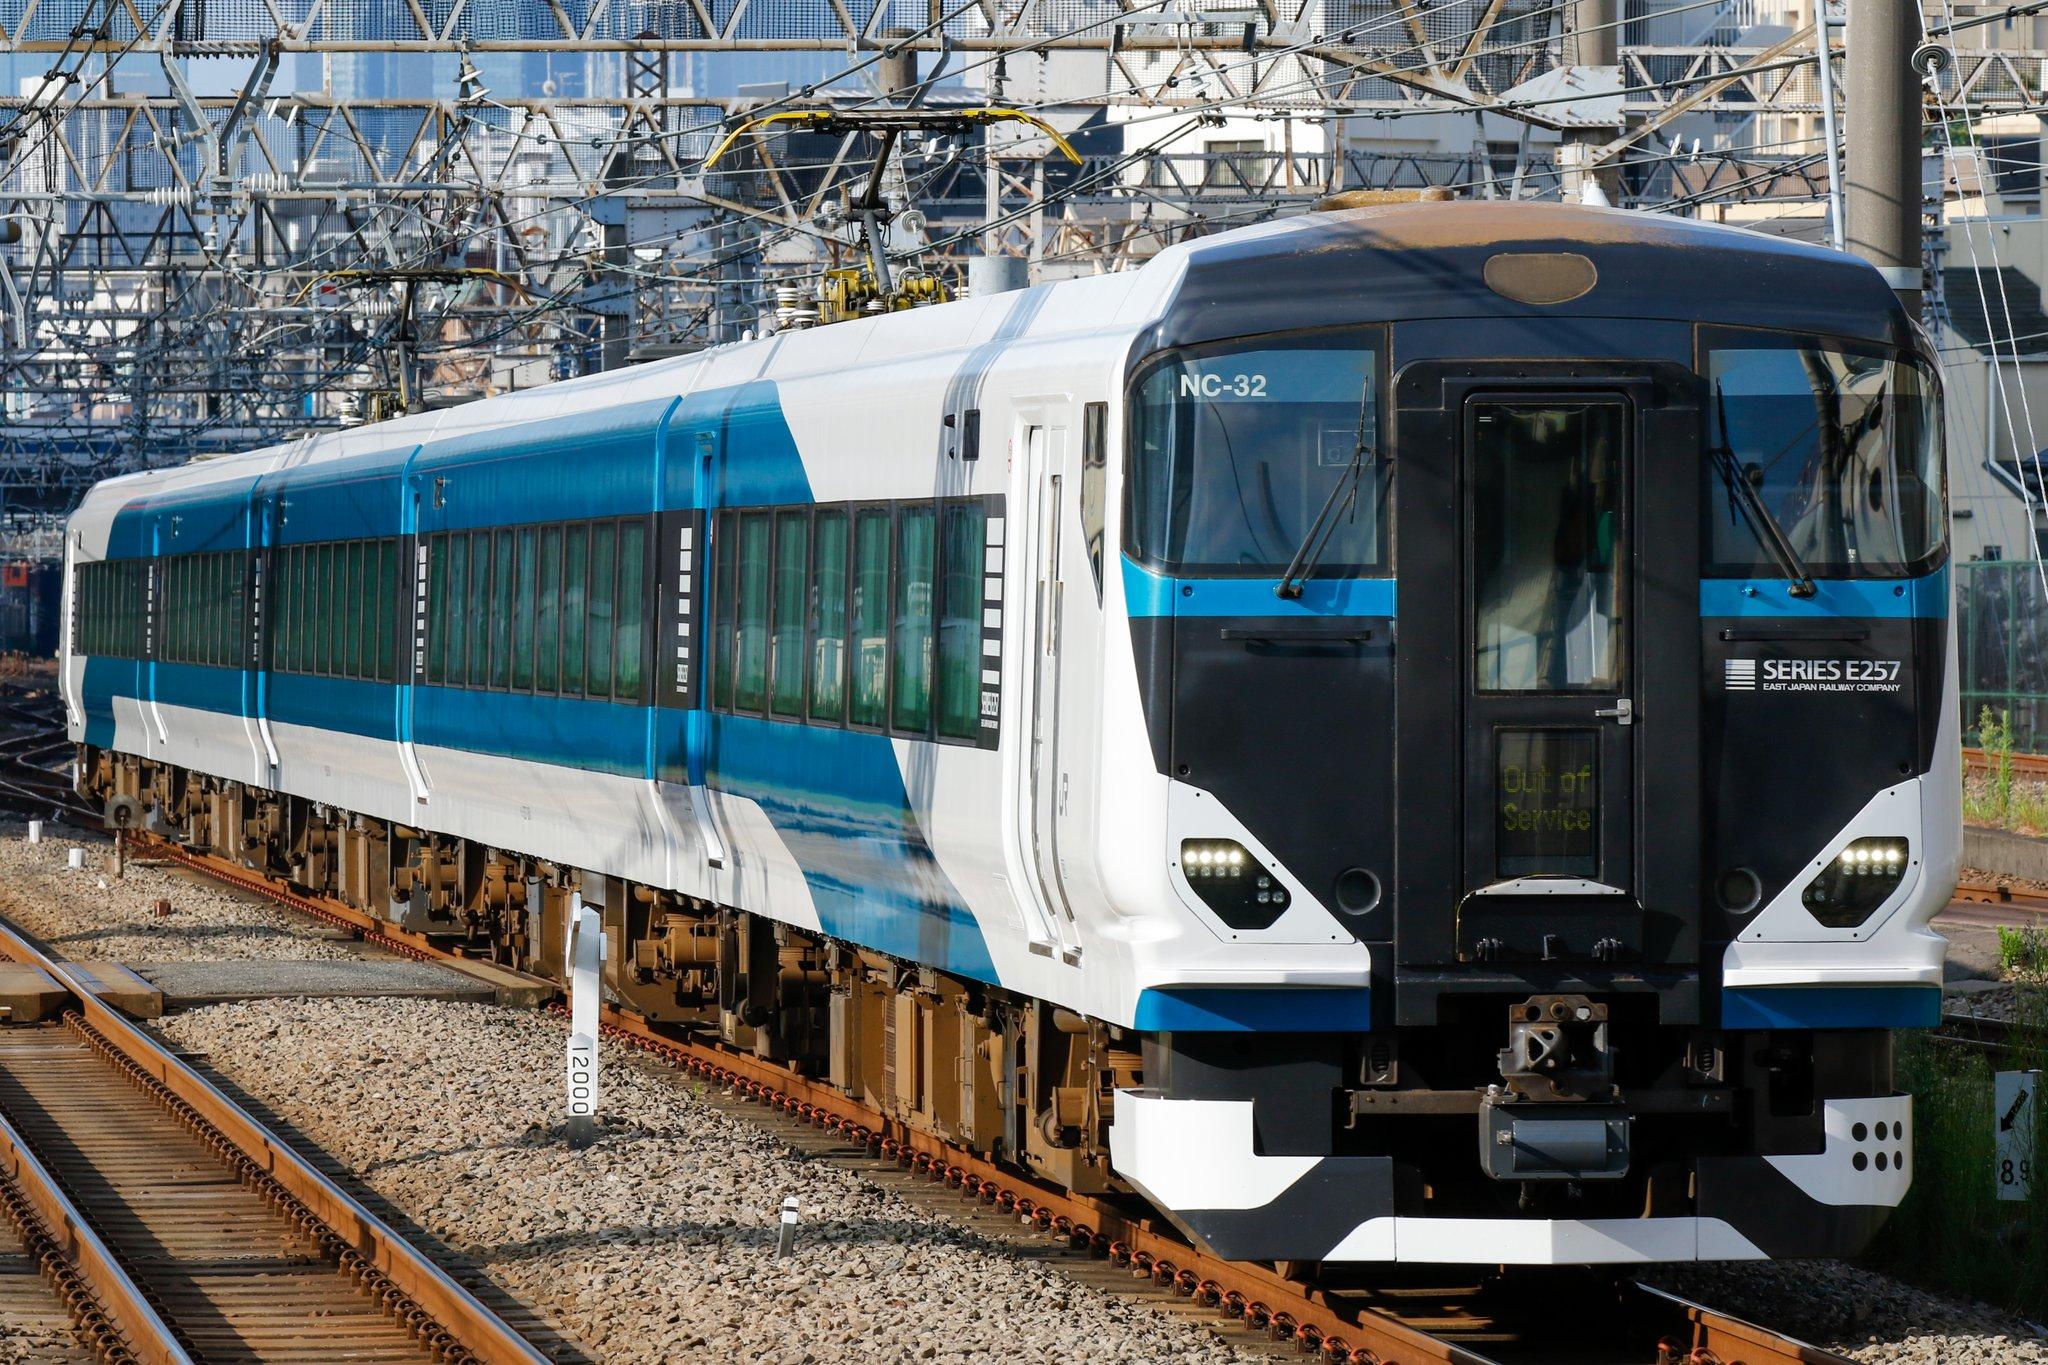 【日中の本線走行は初】E257系2500番台NC-32編成 伊豆箱根鉄道駿豆線から返却回送